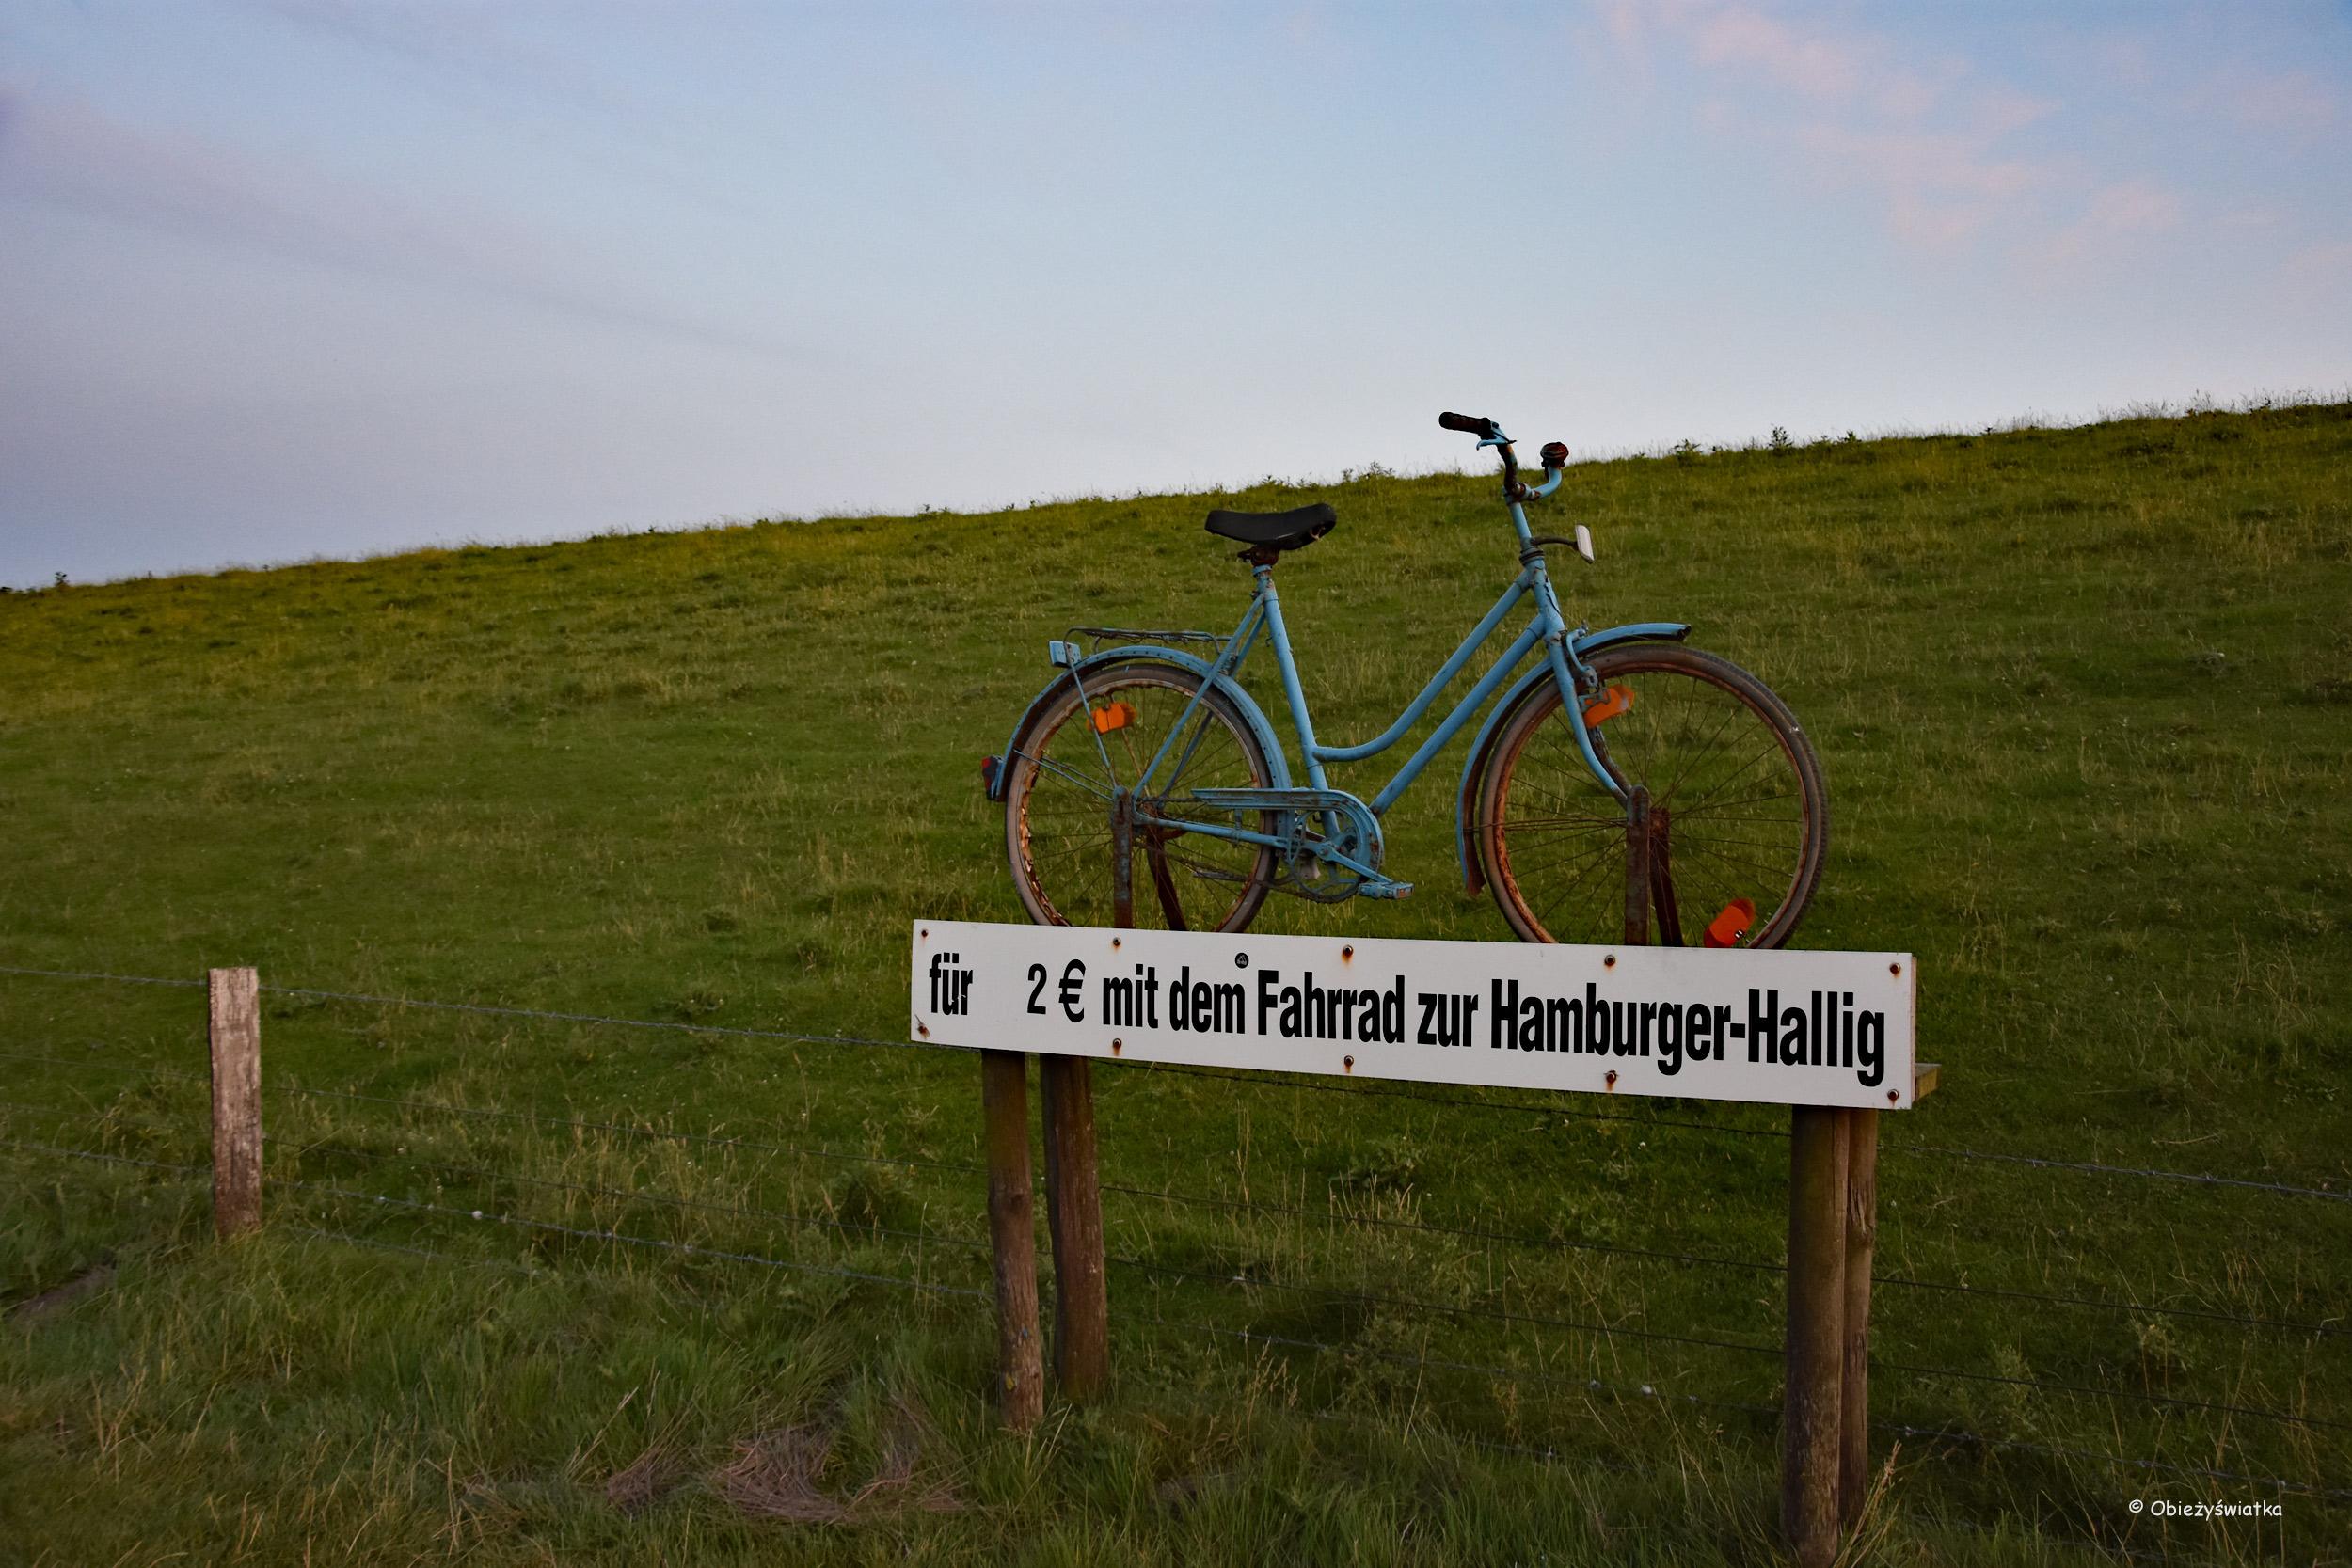 Rowerem na Hamburger Hallig